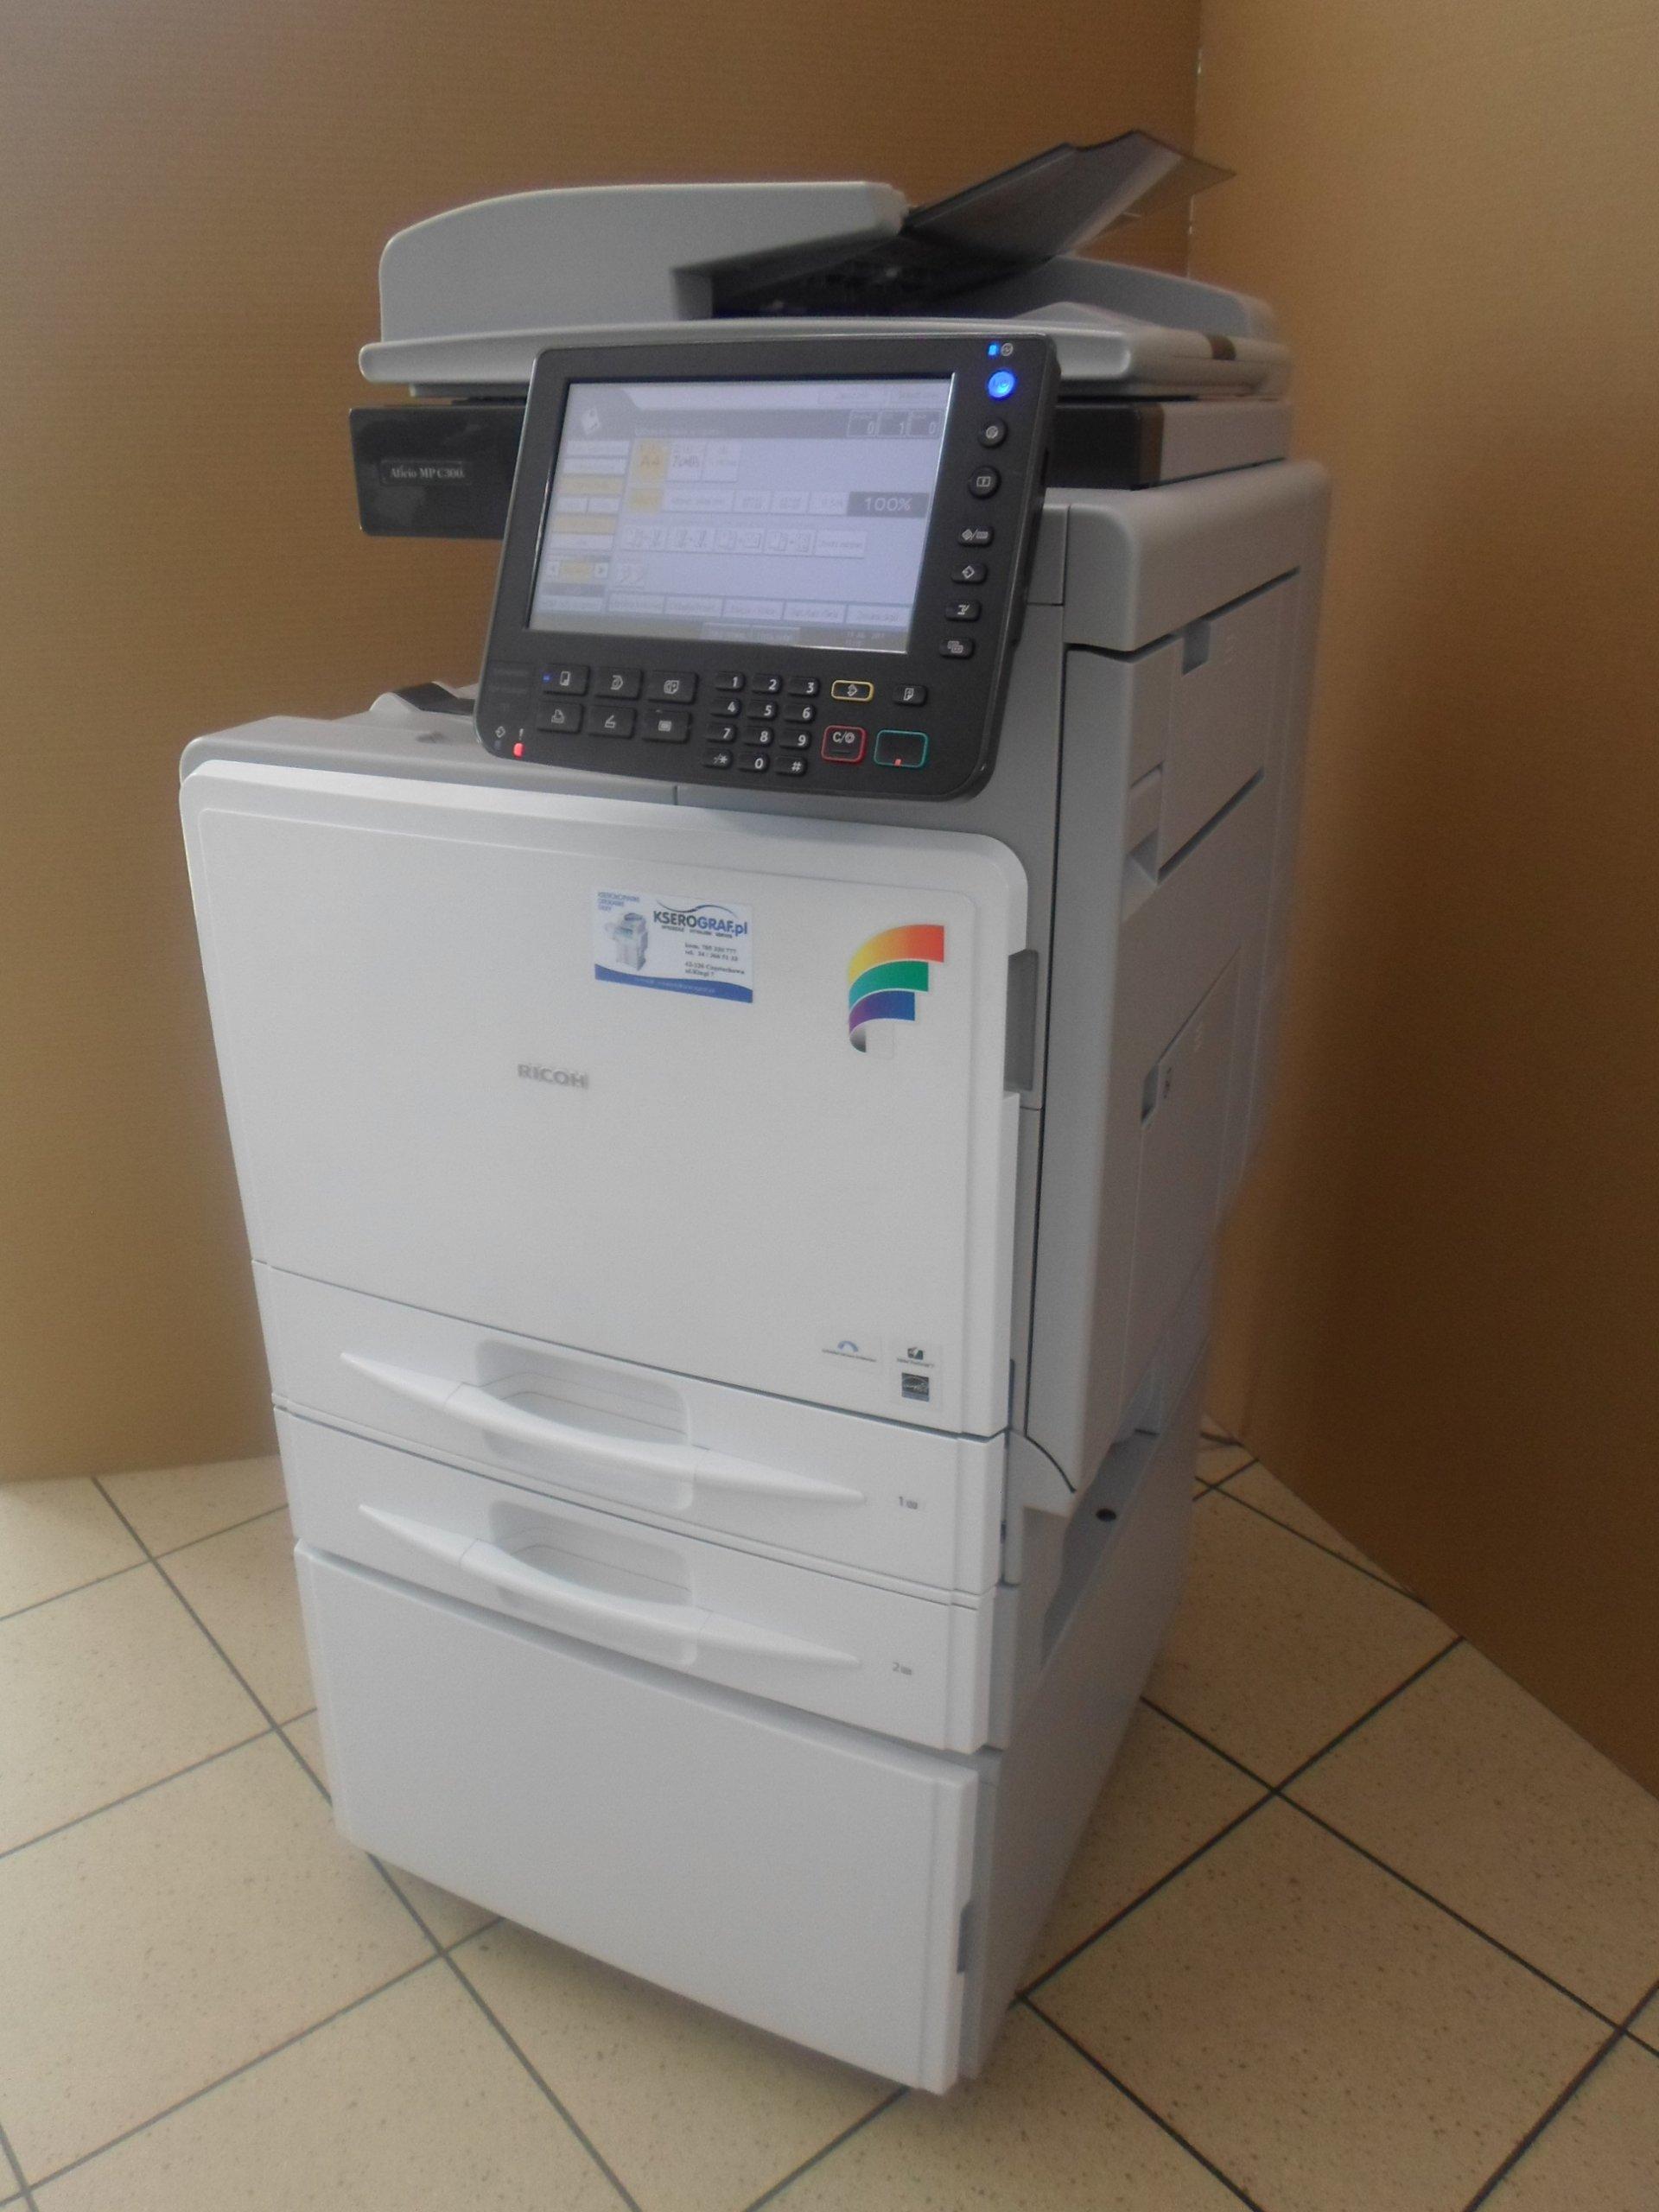 Kolor druk skan MPC300 -przebieg 15 tys. gwarancja